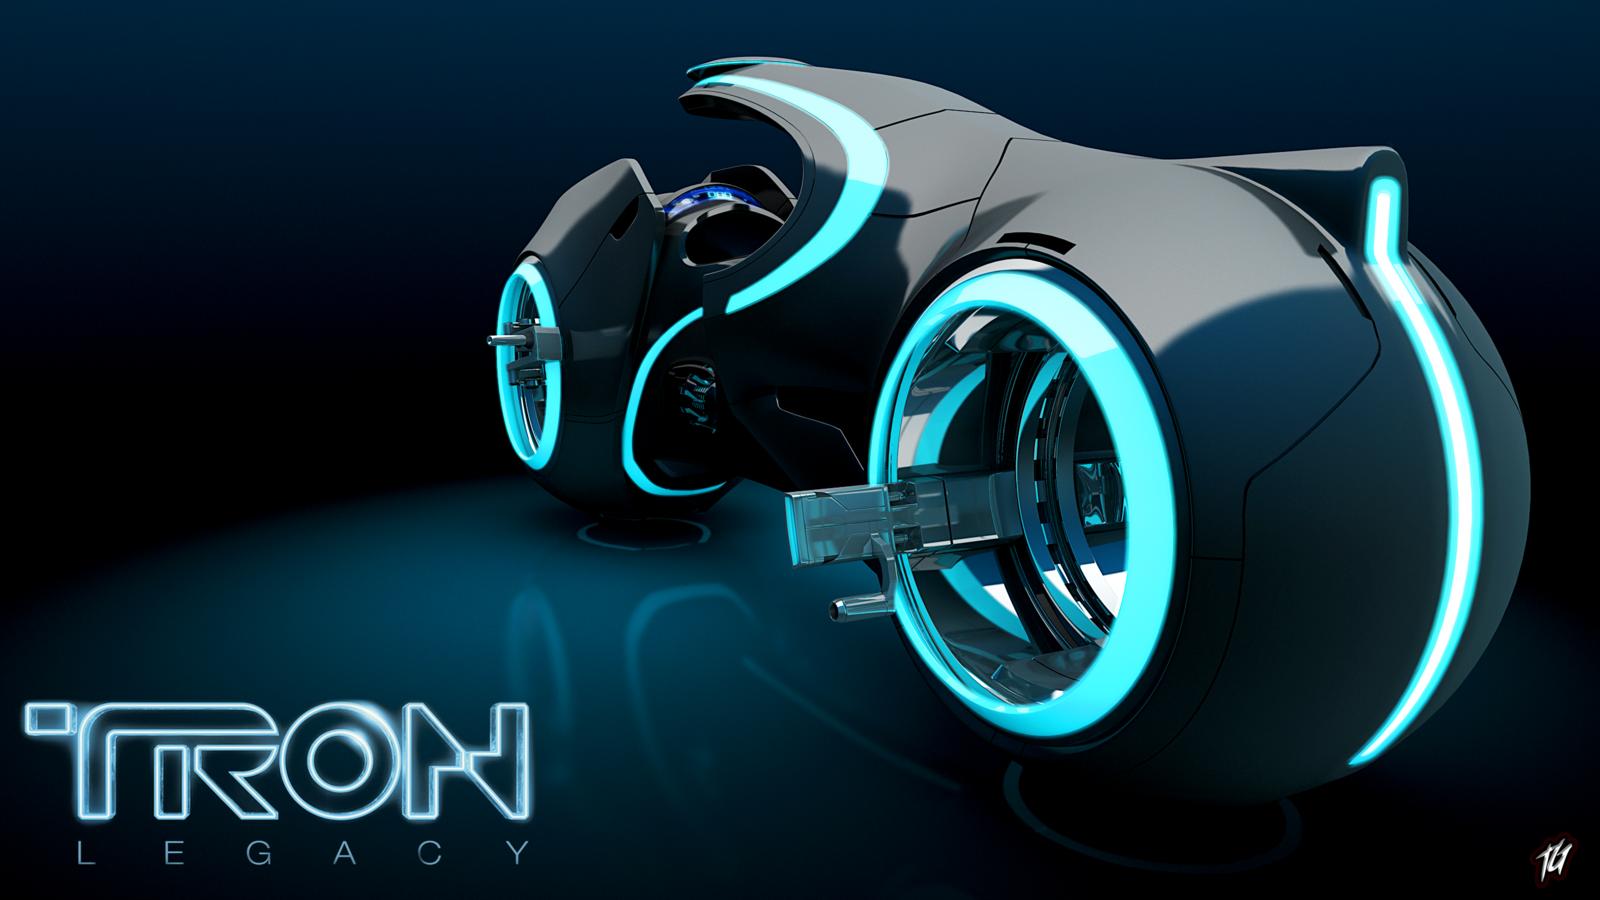 Tron Bike Neon Wallpaper | wallpapers | Pinterest | Neon wallpaper